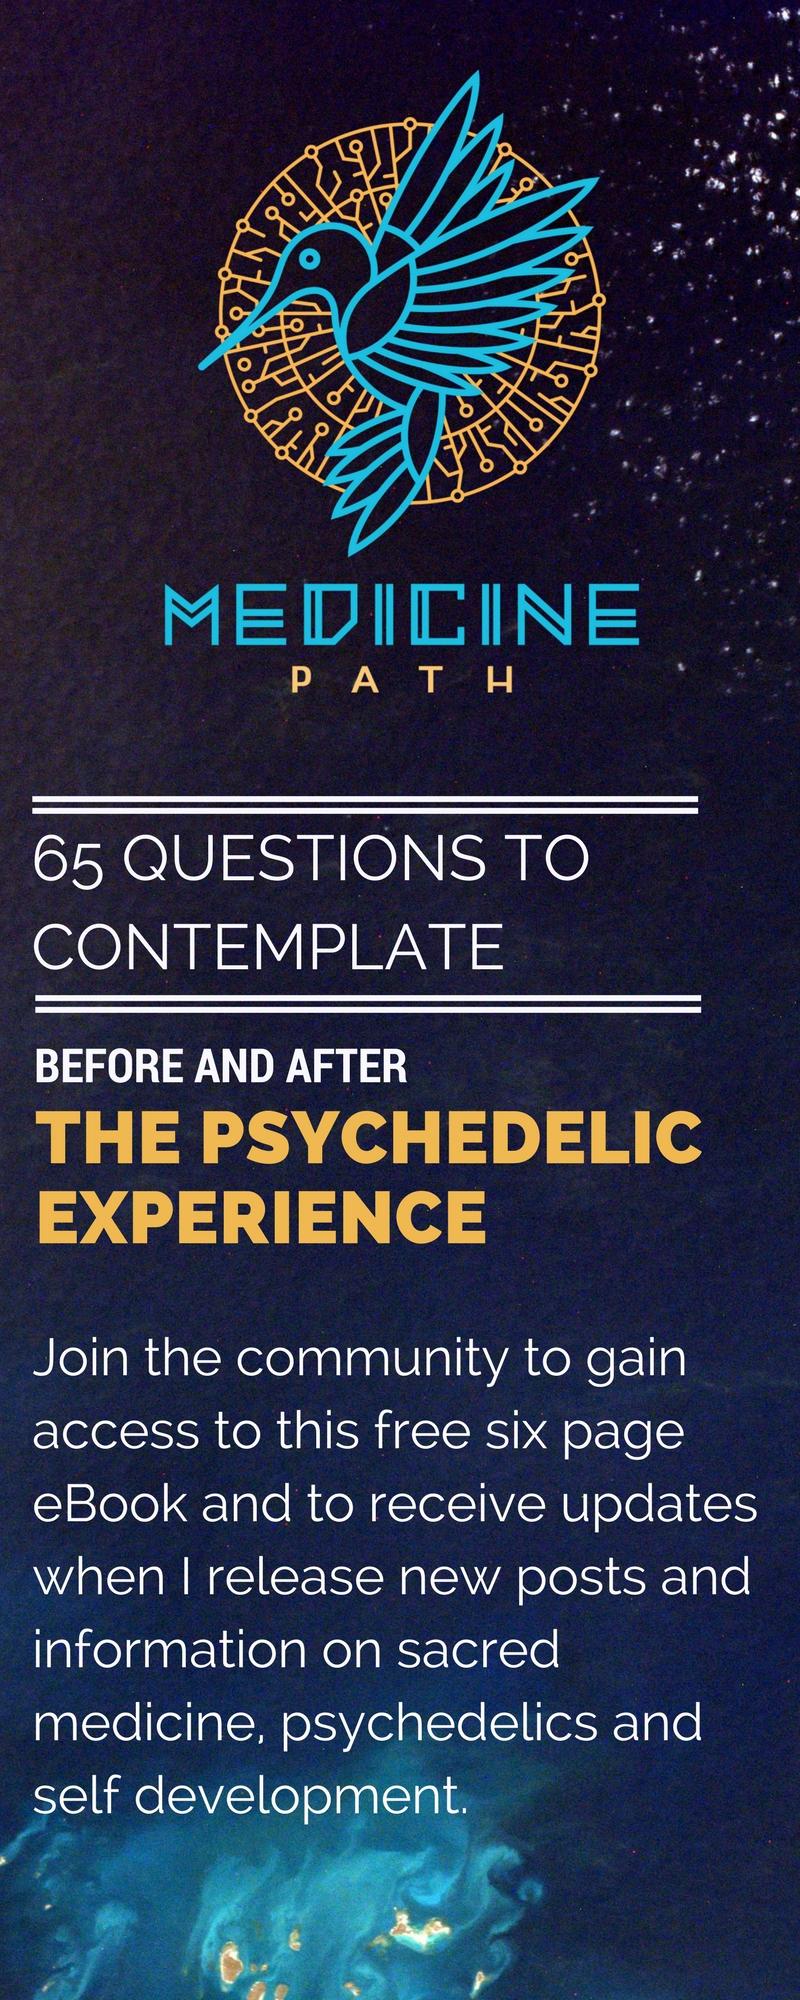 Medicine Path 65 Questions